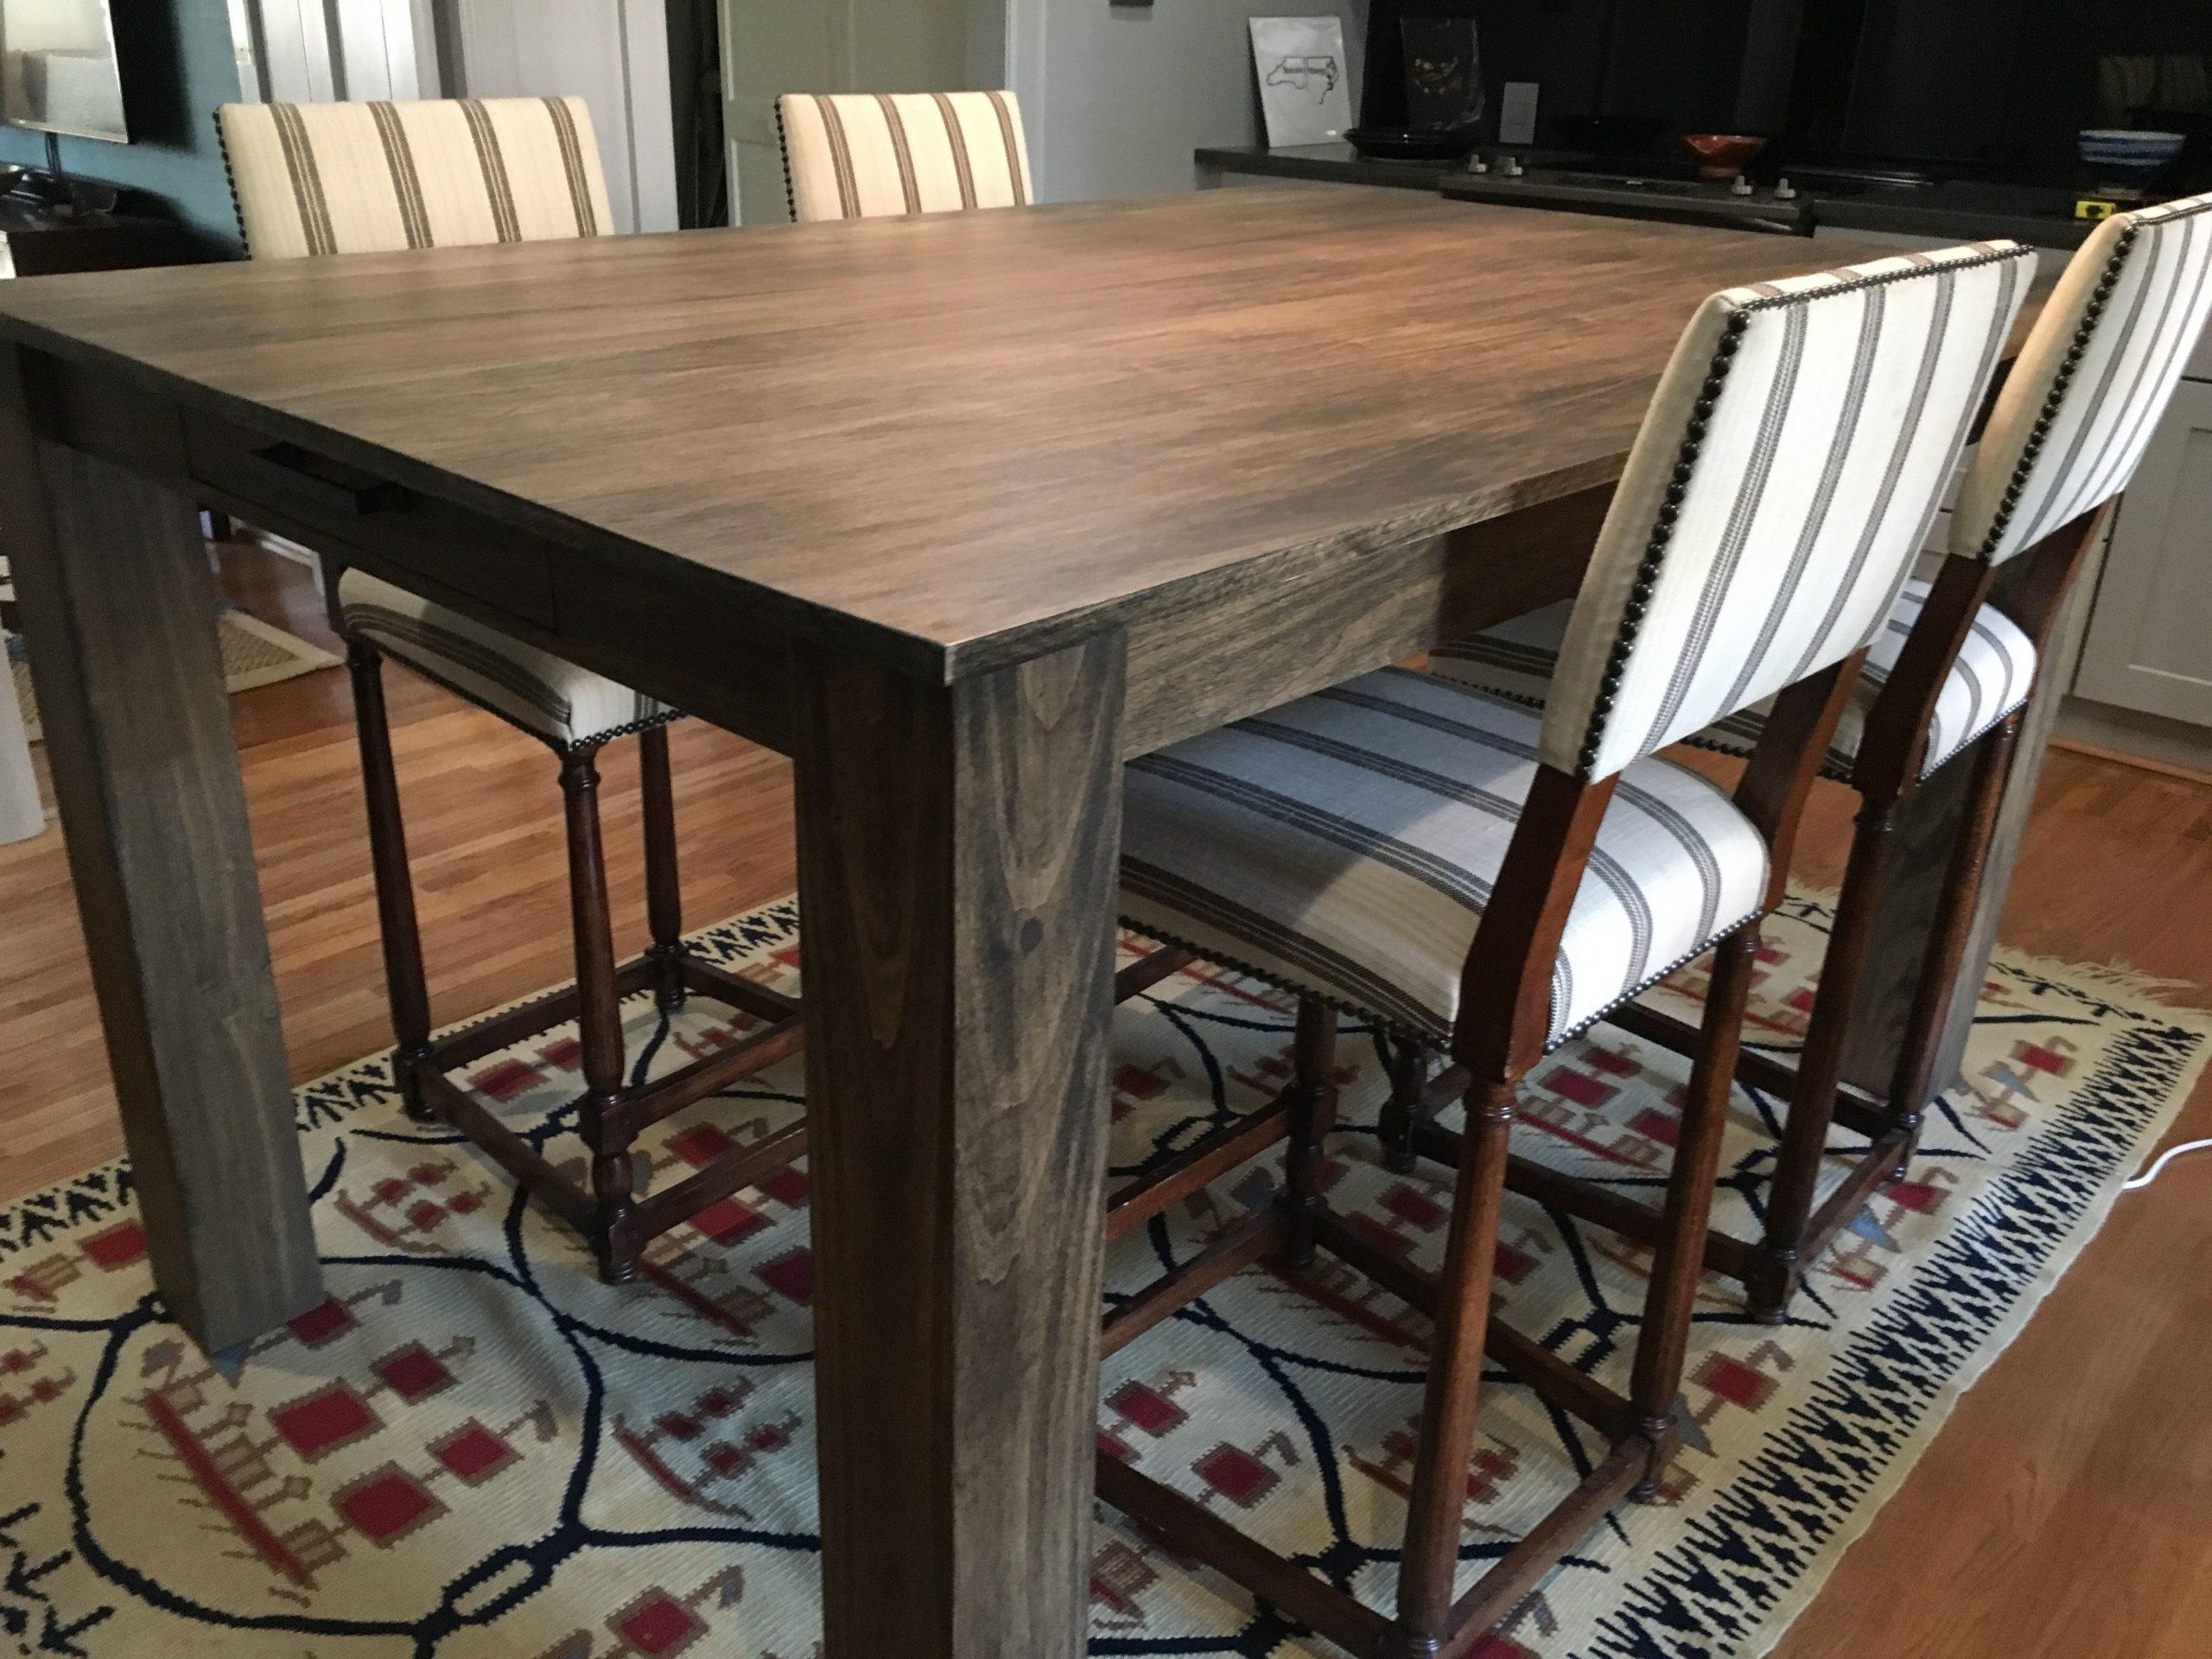 Custom Modern Rustic Dining Table Edwood Art Craft within sizing 4032 X 3024